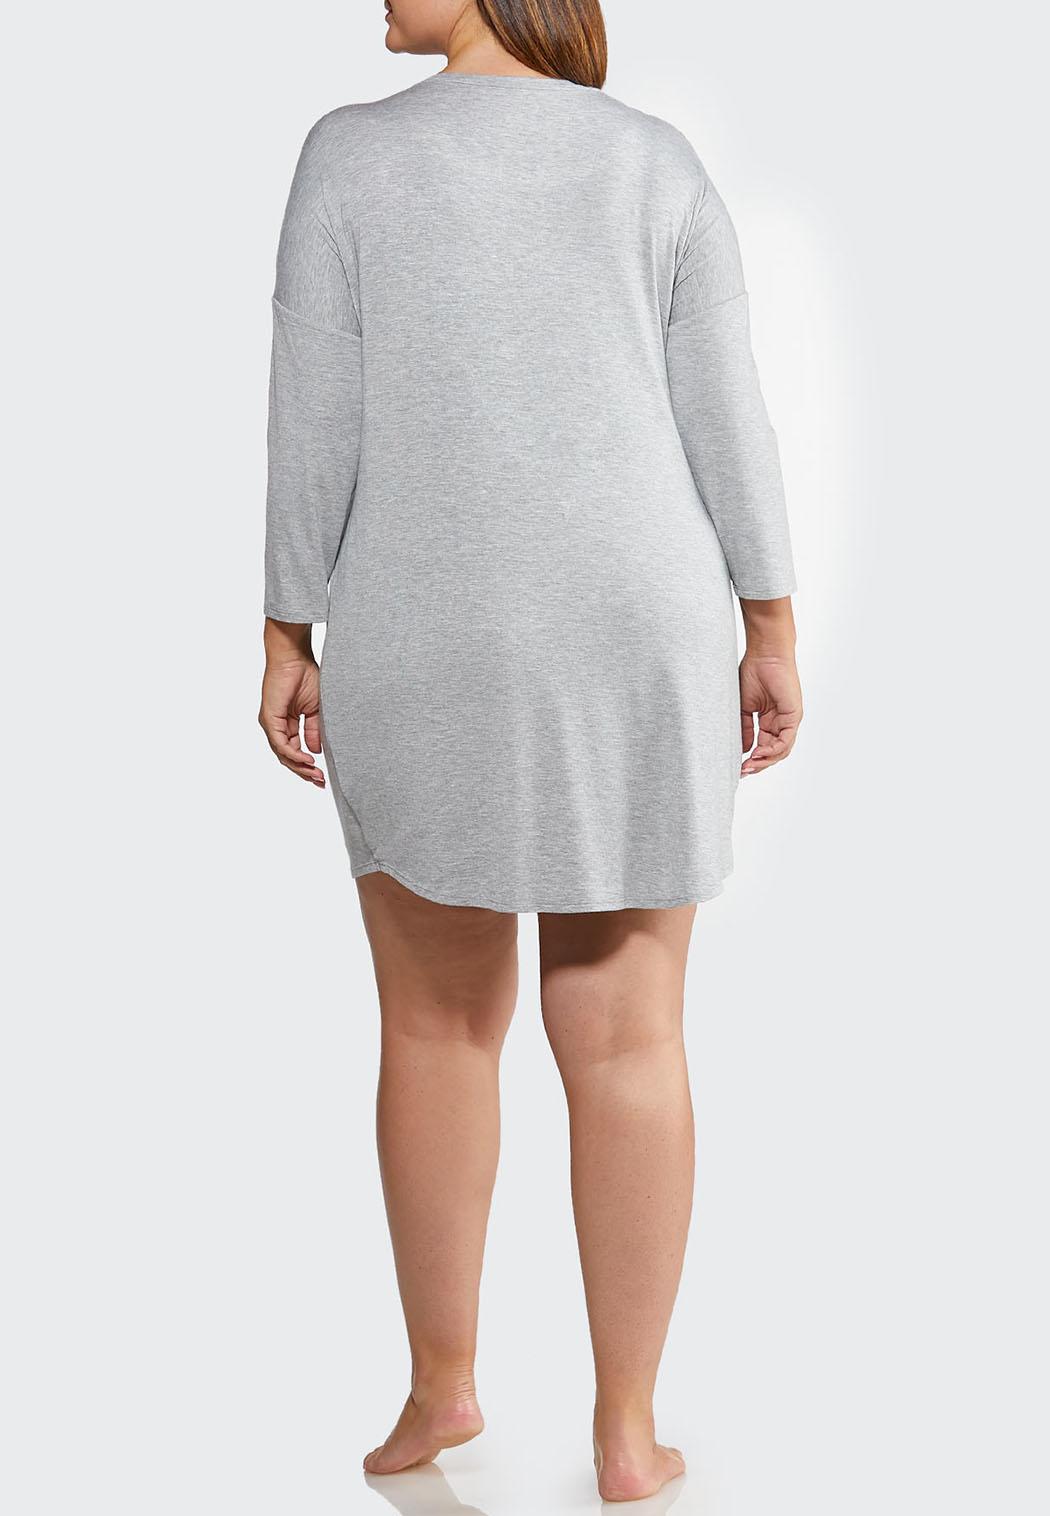 Plus Size Glitter Moon Sleep Shirt (Item #44013925)